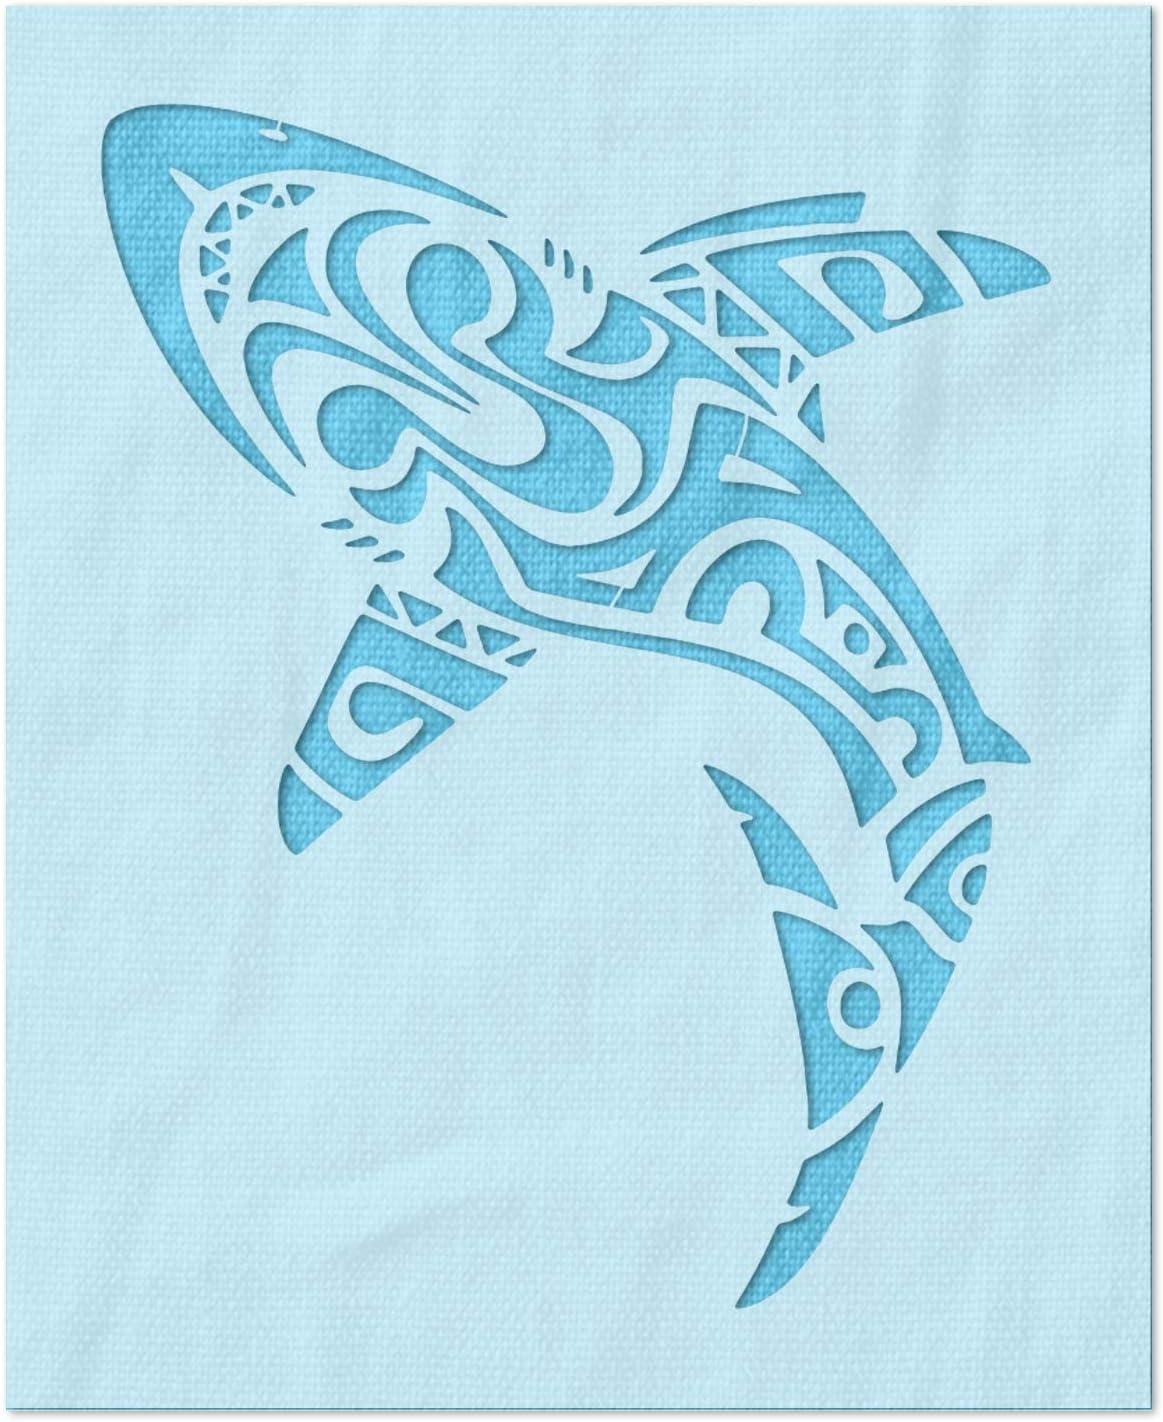 Stencil Stop Polynesian Houston Mall Baltimore Mall Shark - Project for Reusable DIY